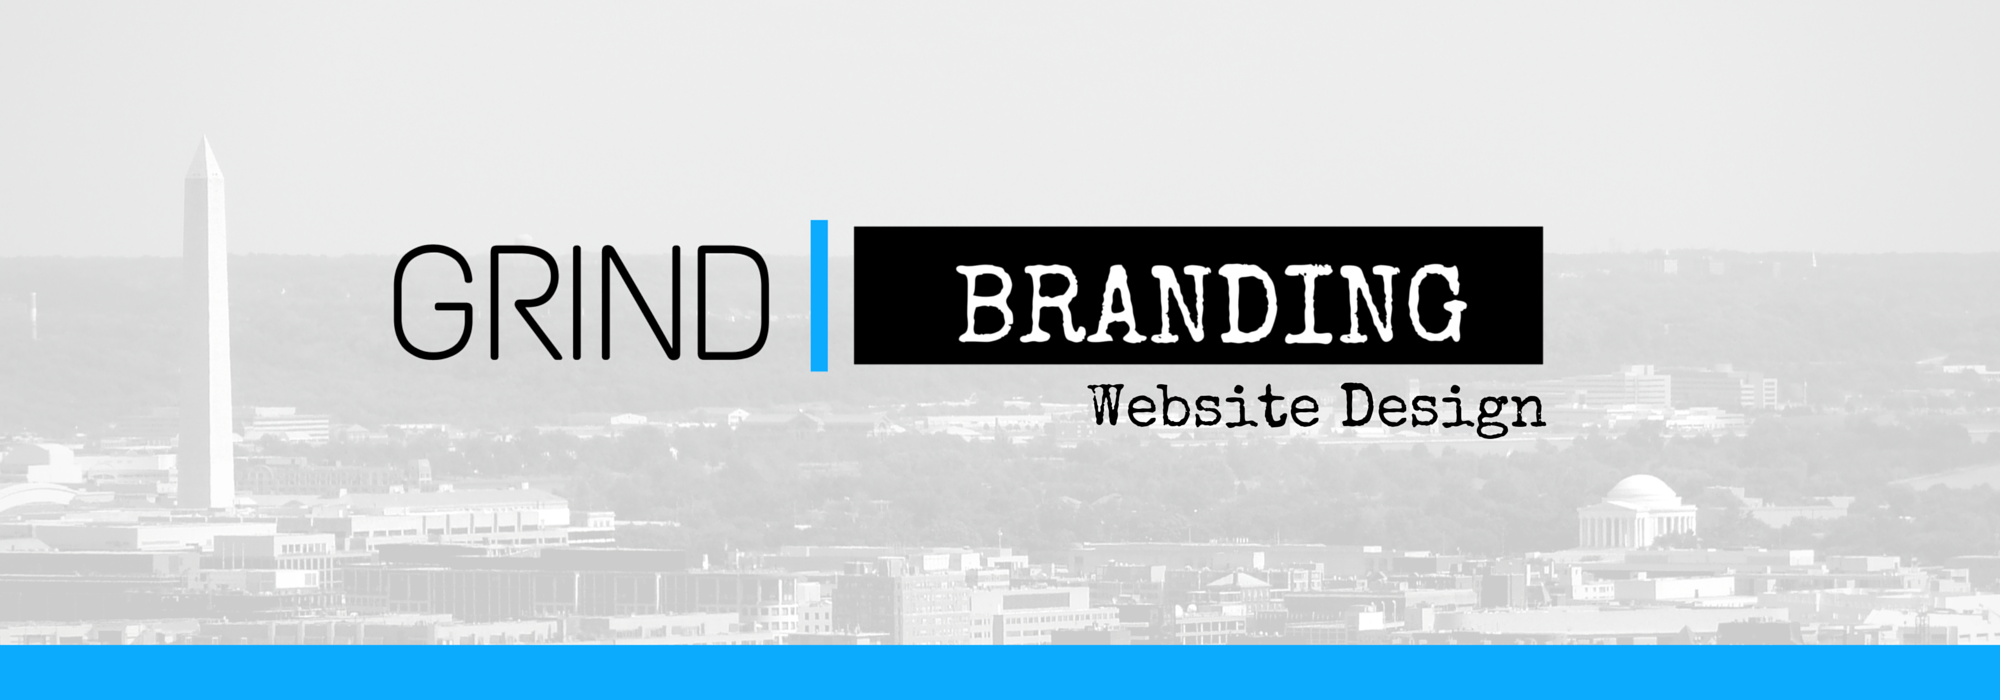 GRIND Branding